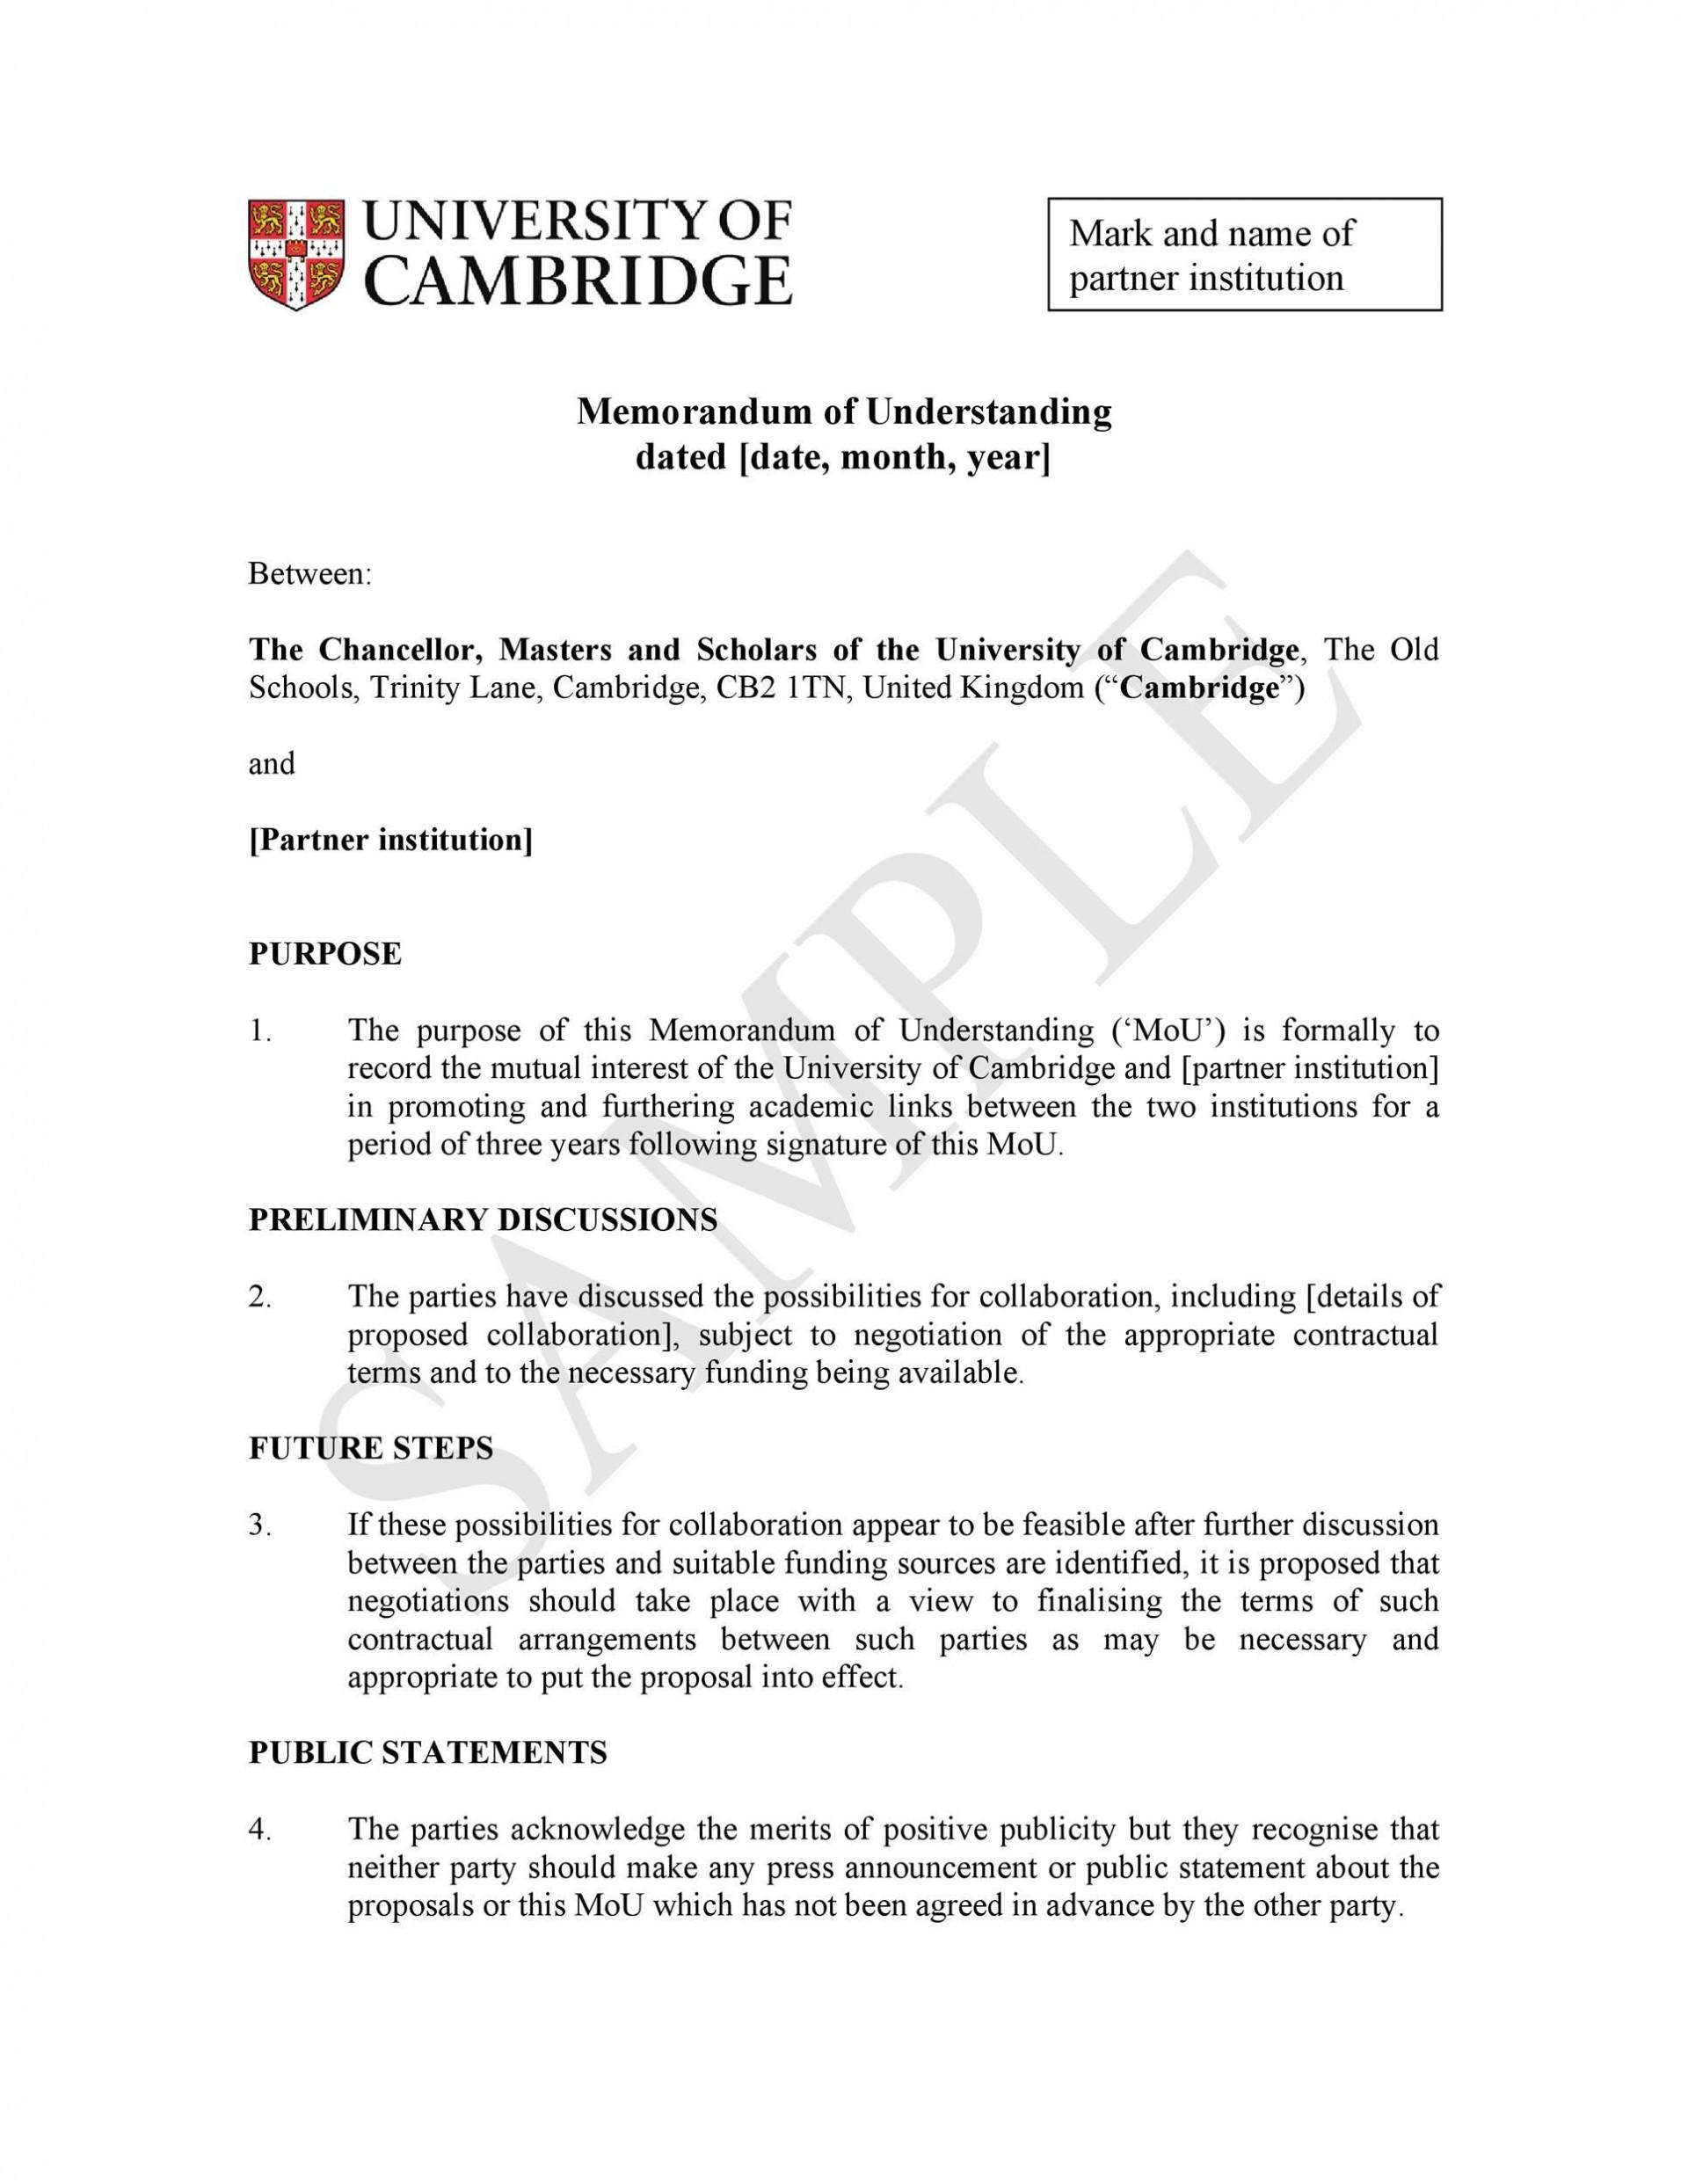 005 Striking Letter Of Understanding Sample Format Highest Clarity 1920